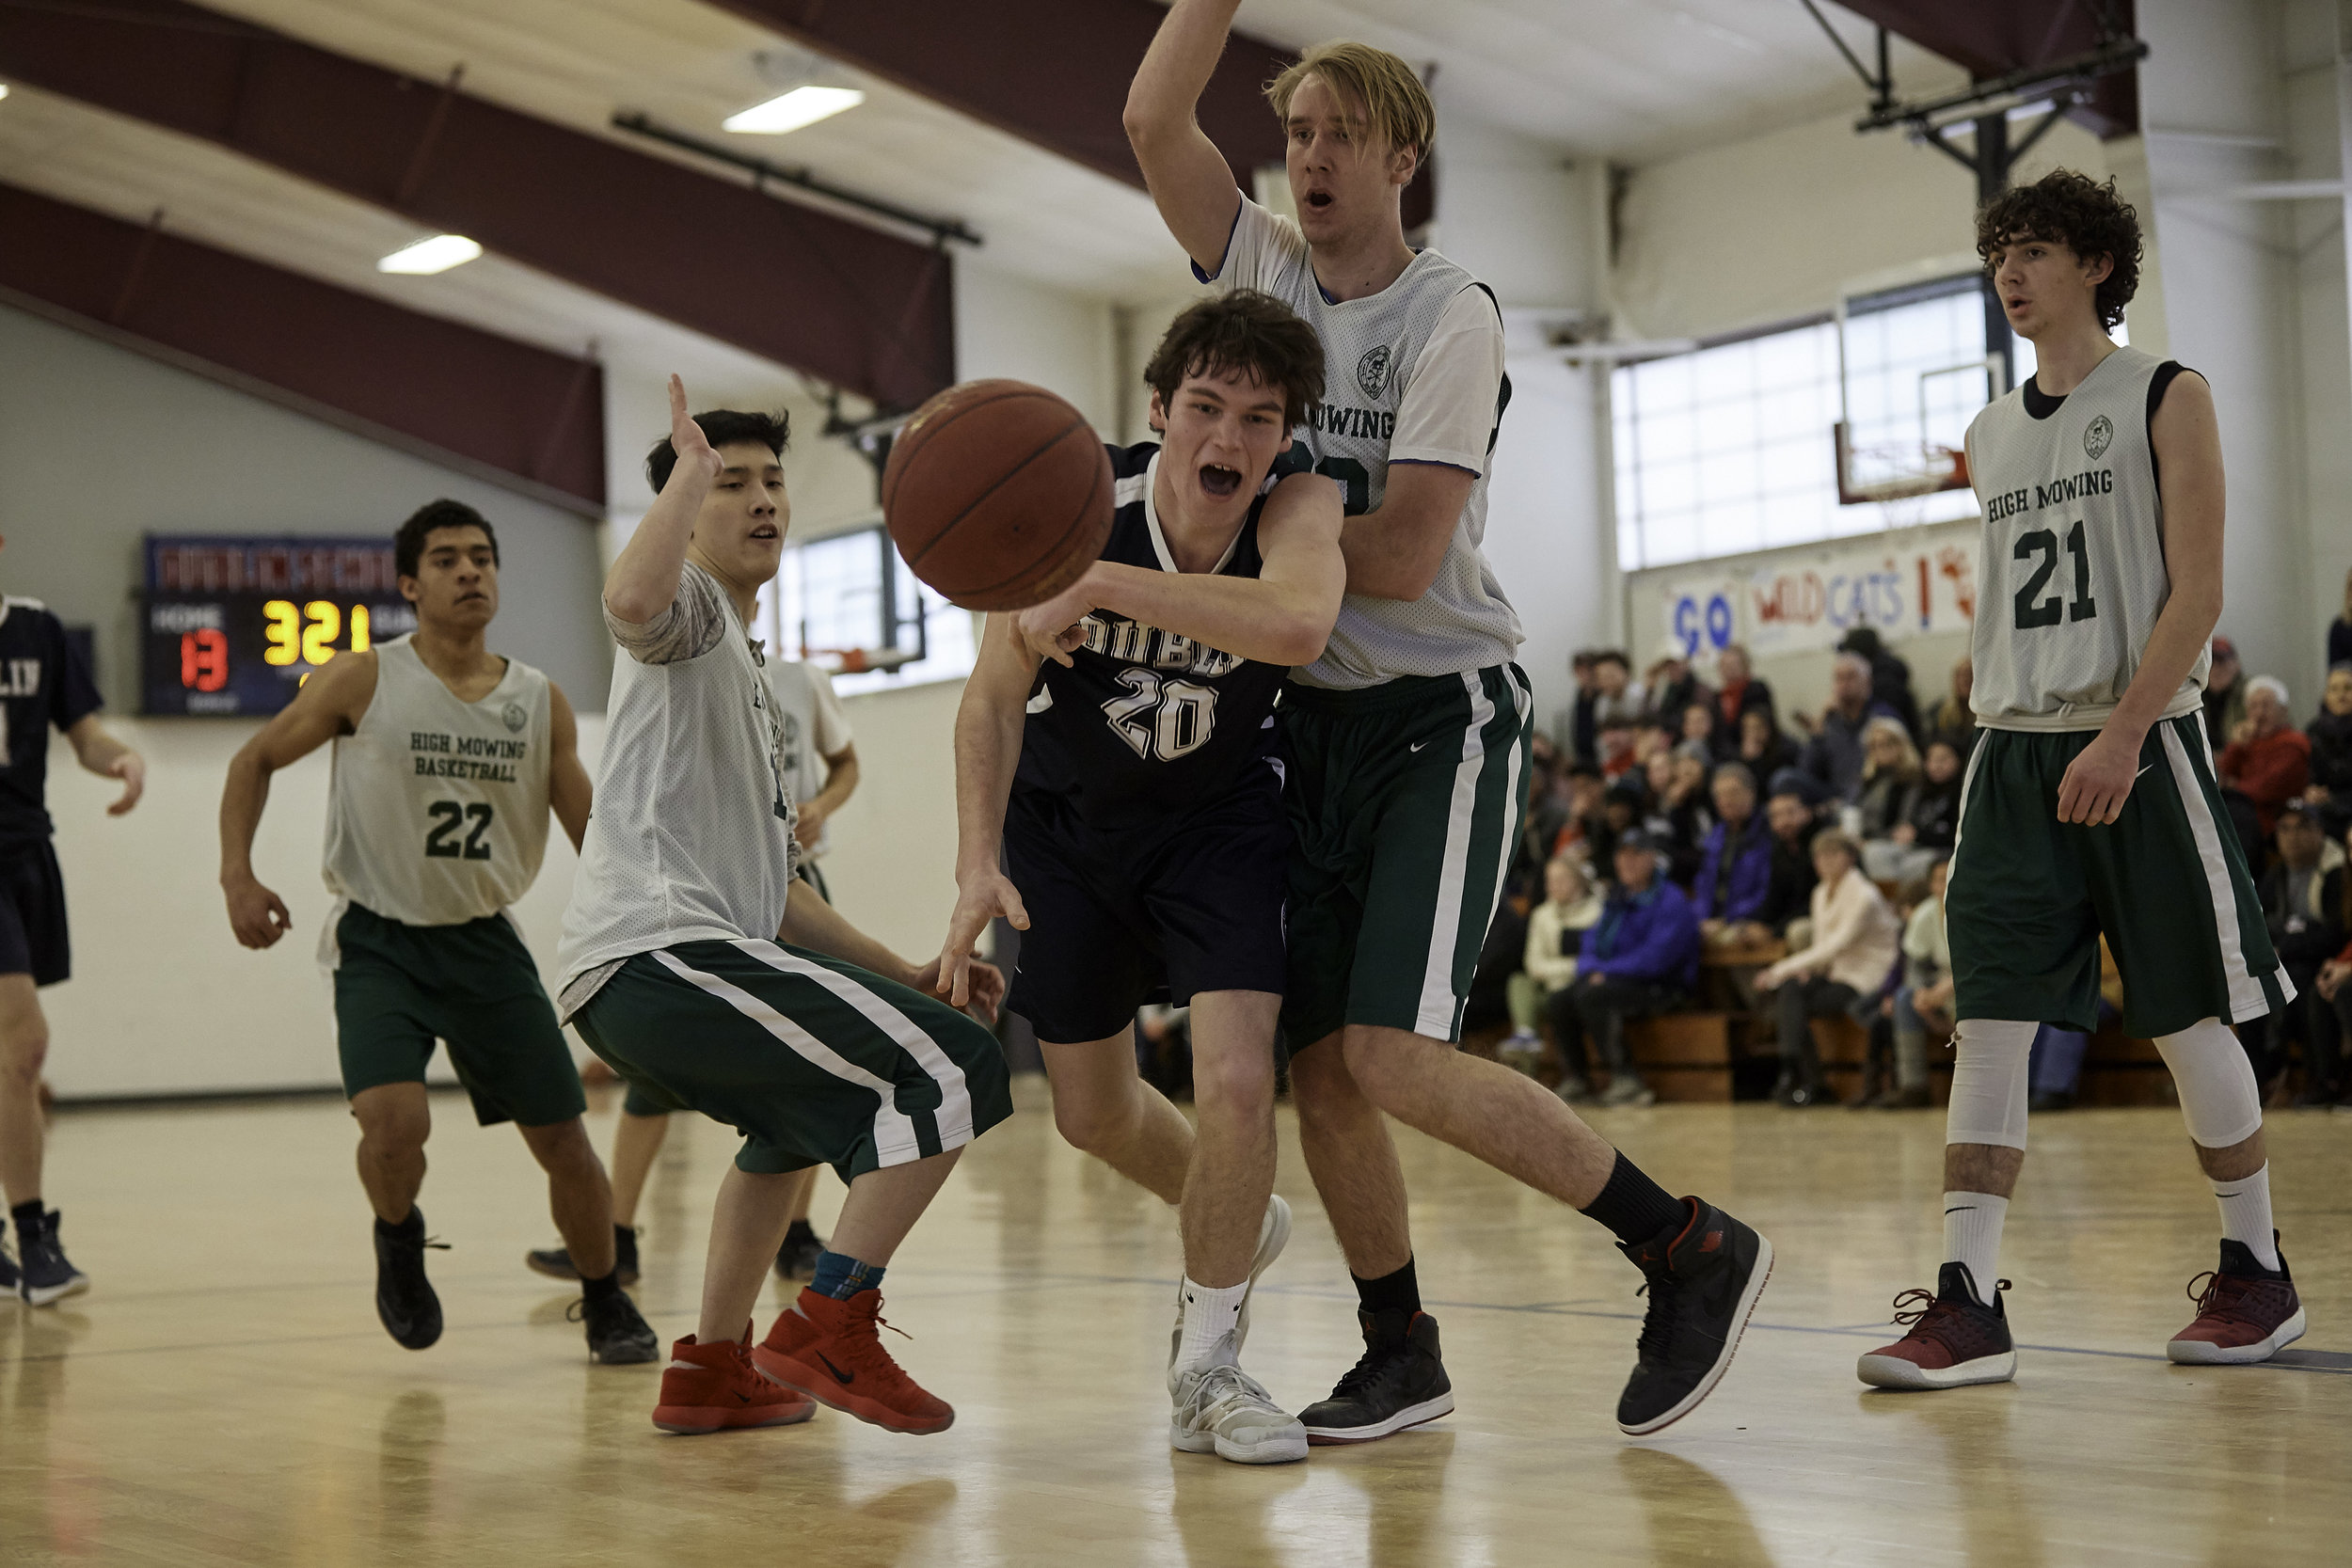 Boys Varsity Basketball vs High Mowing School - Feb 02 2019 - 0032.jpg